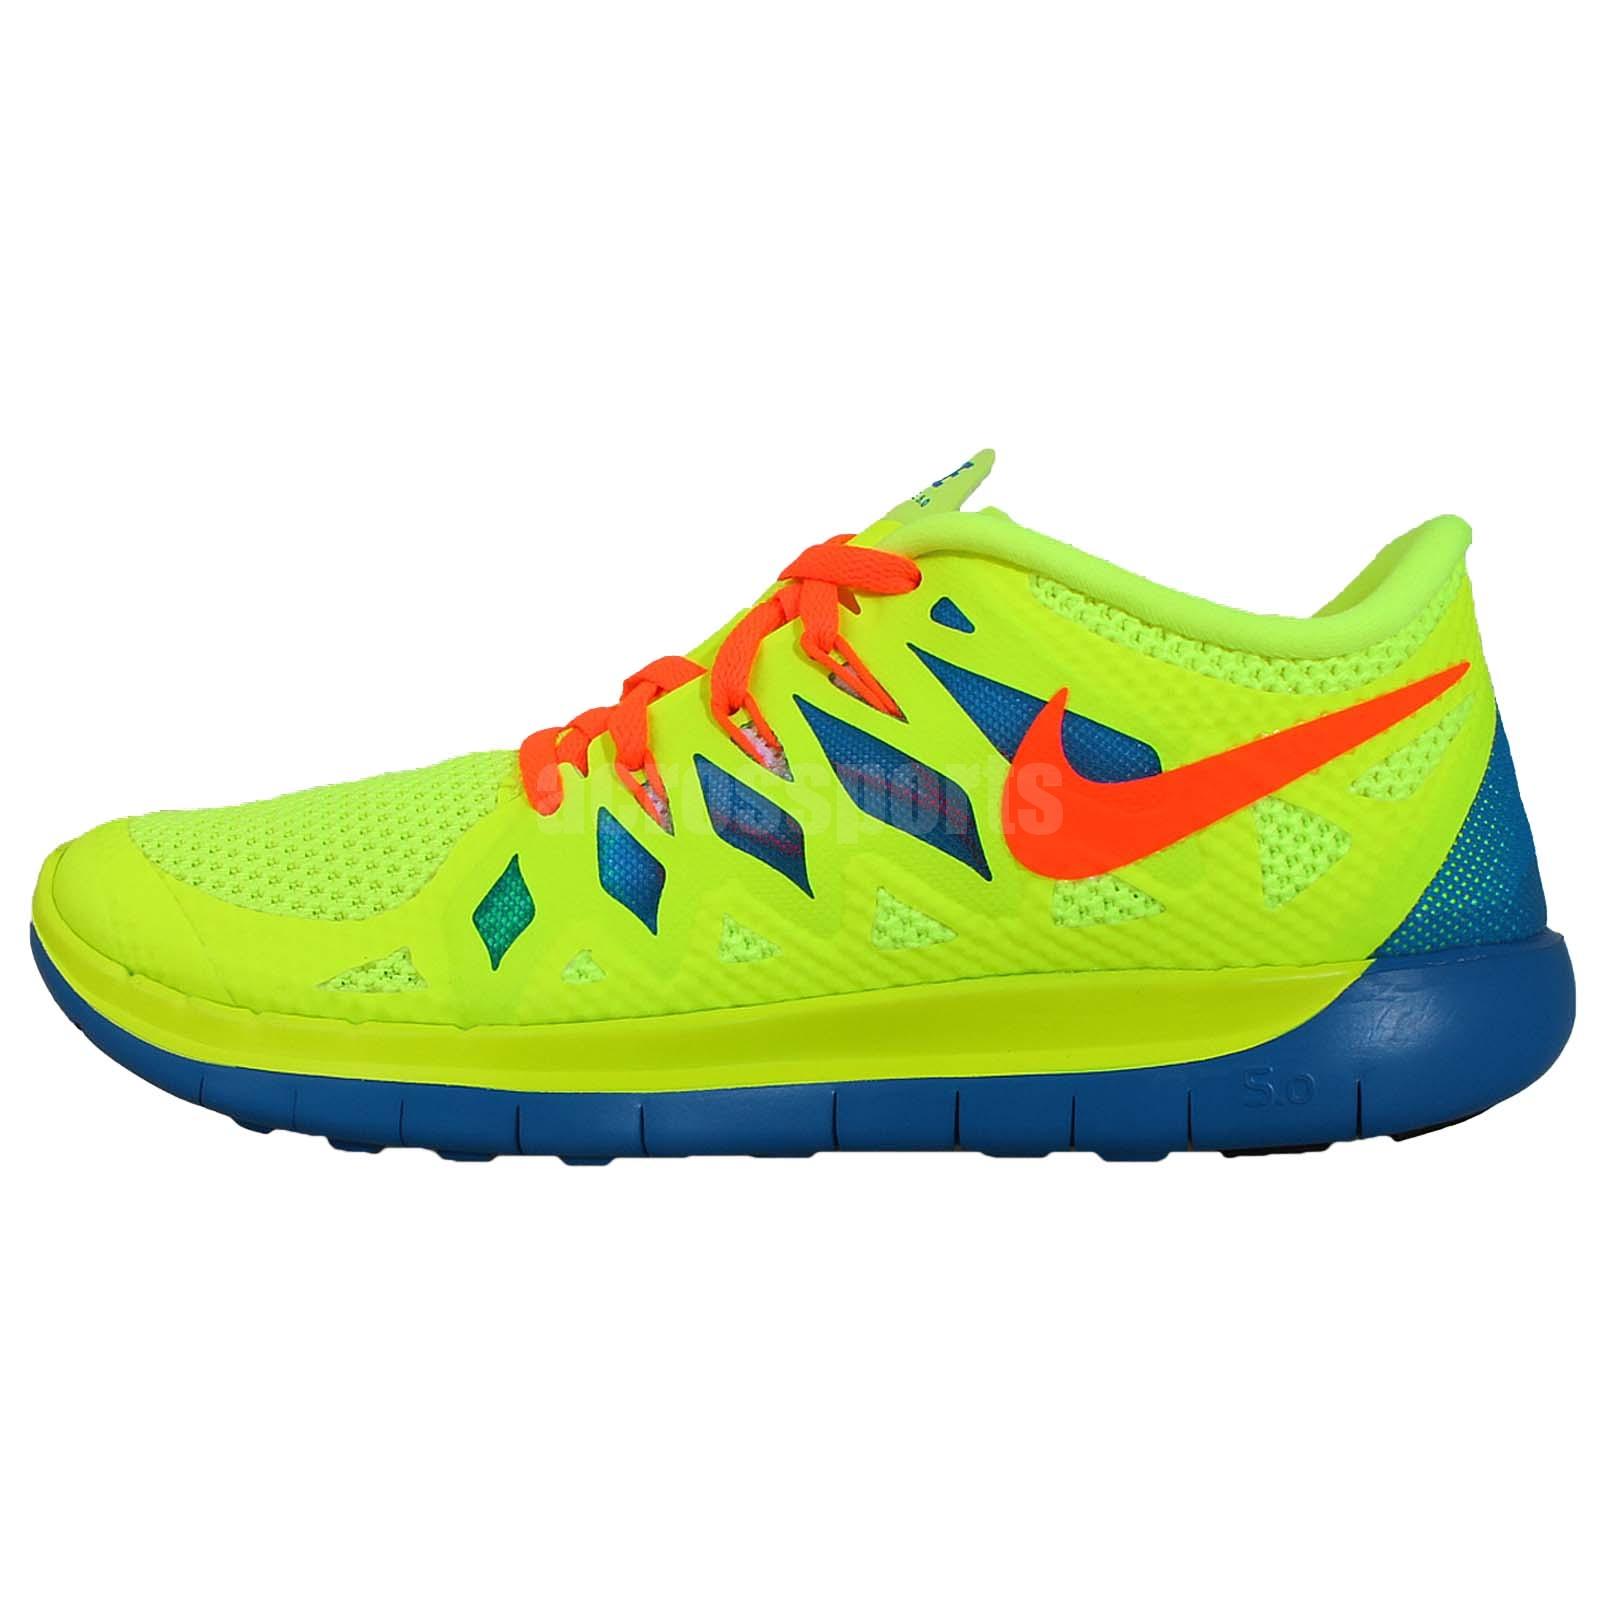 Nike Free 5.0 Neon